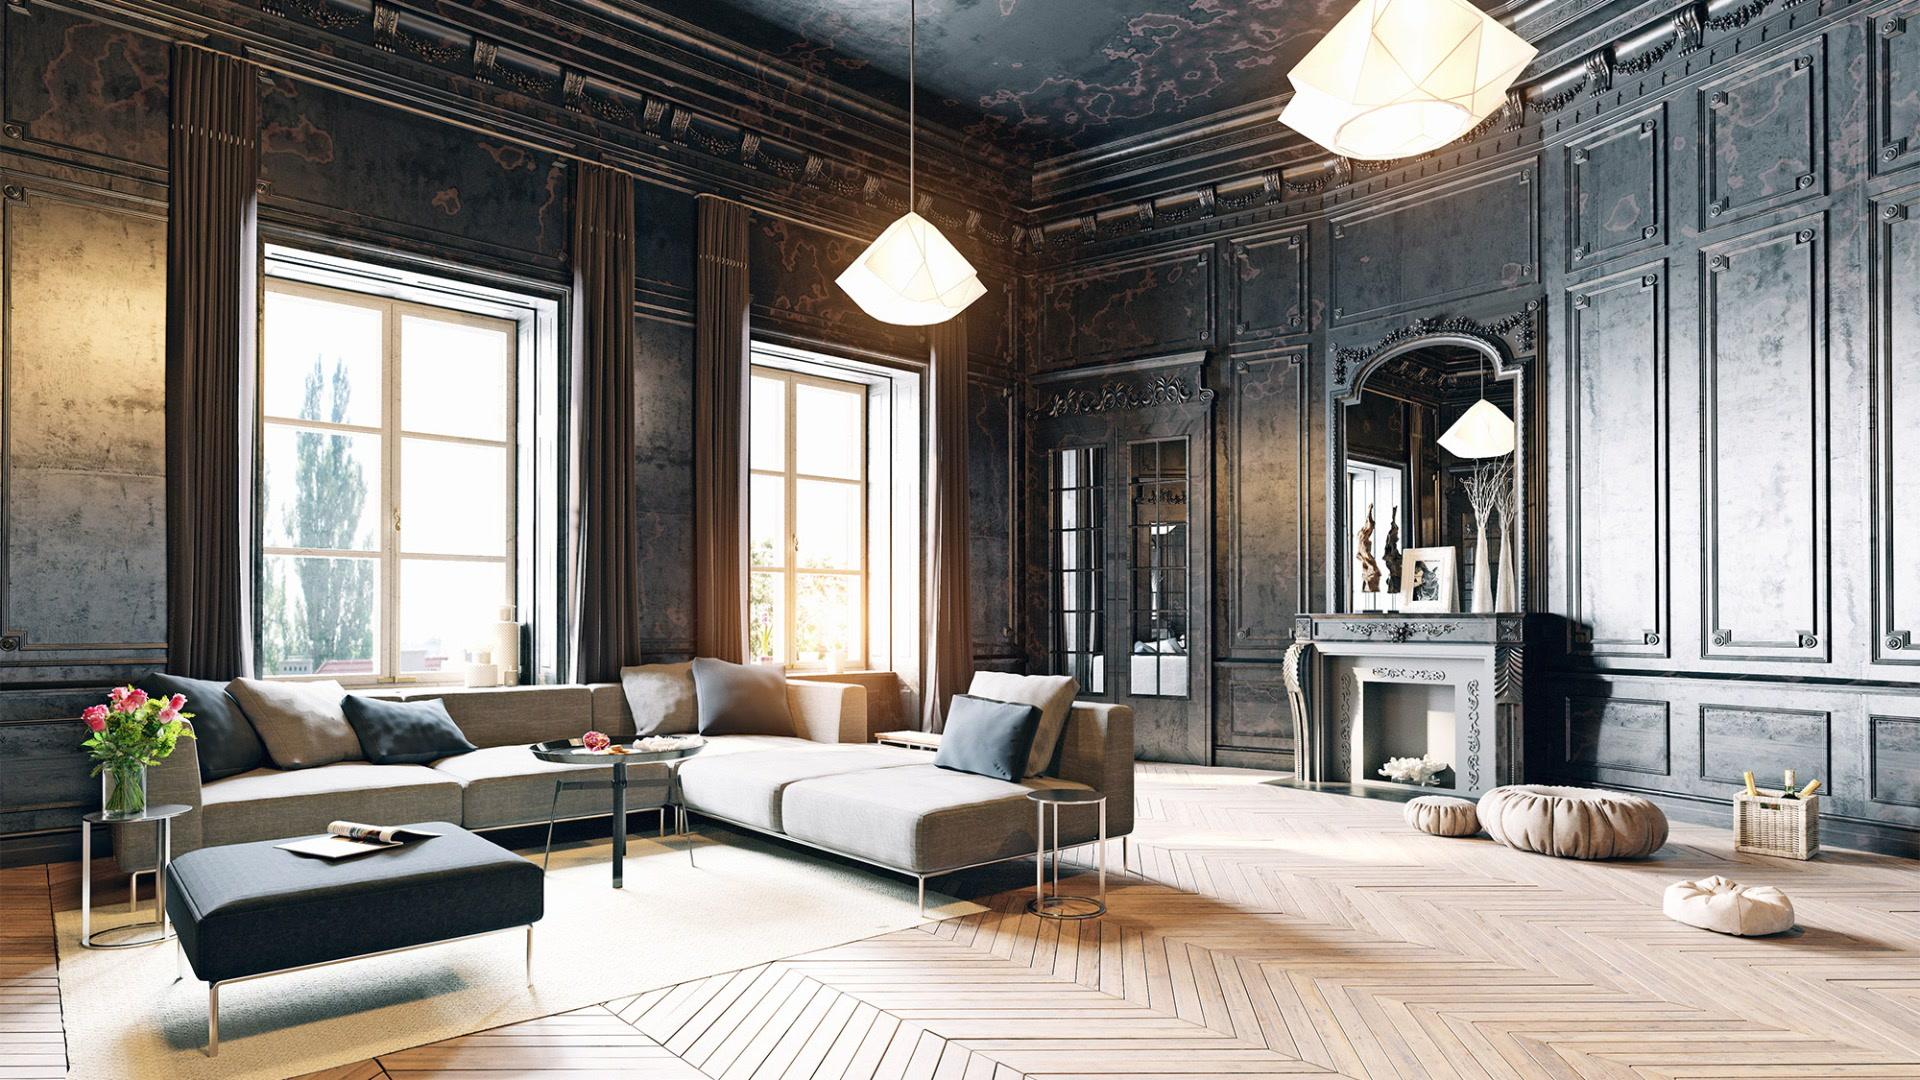 Improved shelf and glamorous living room